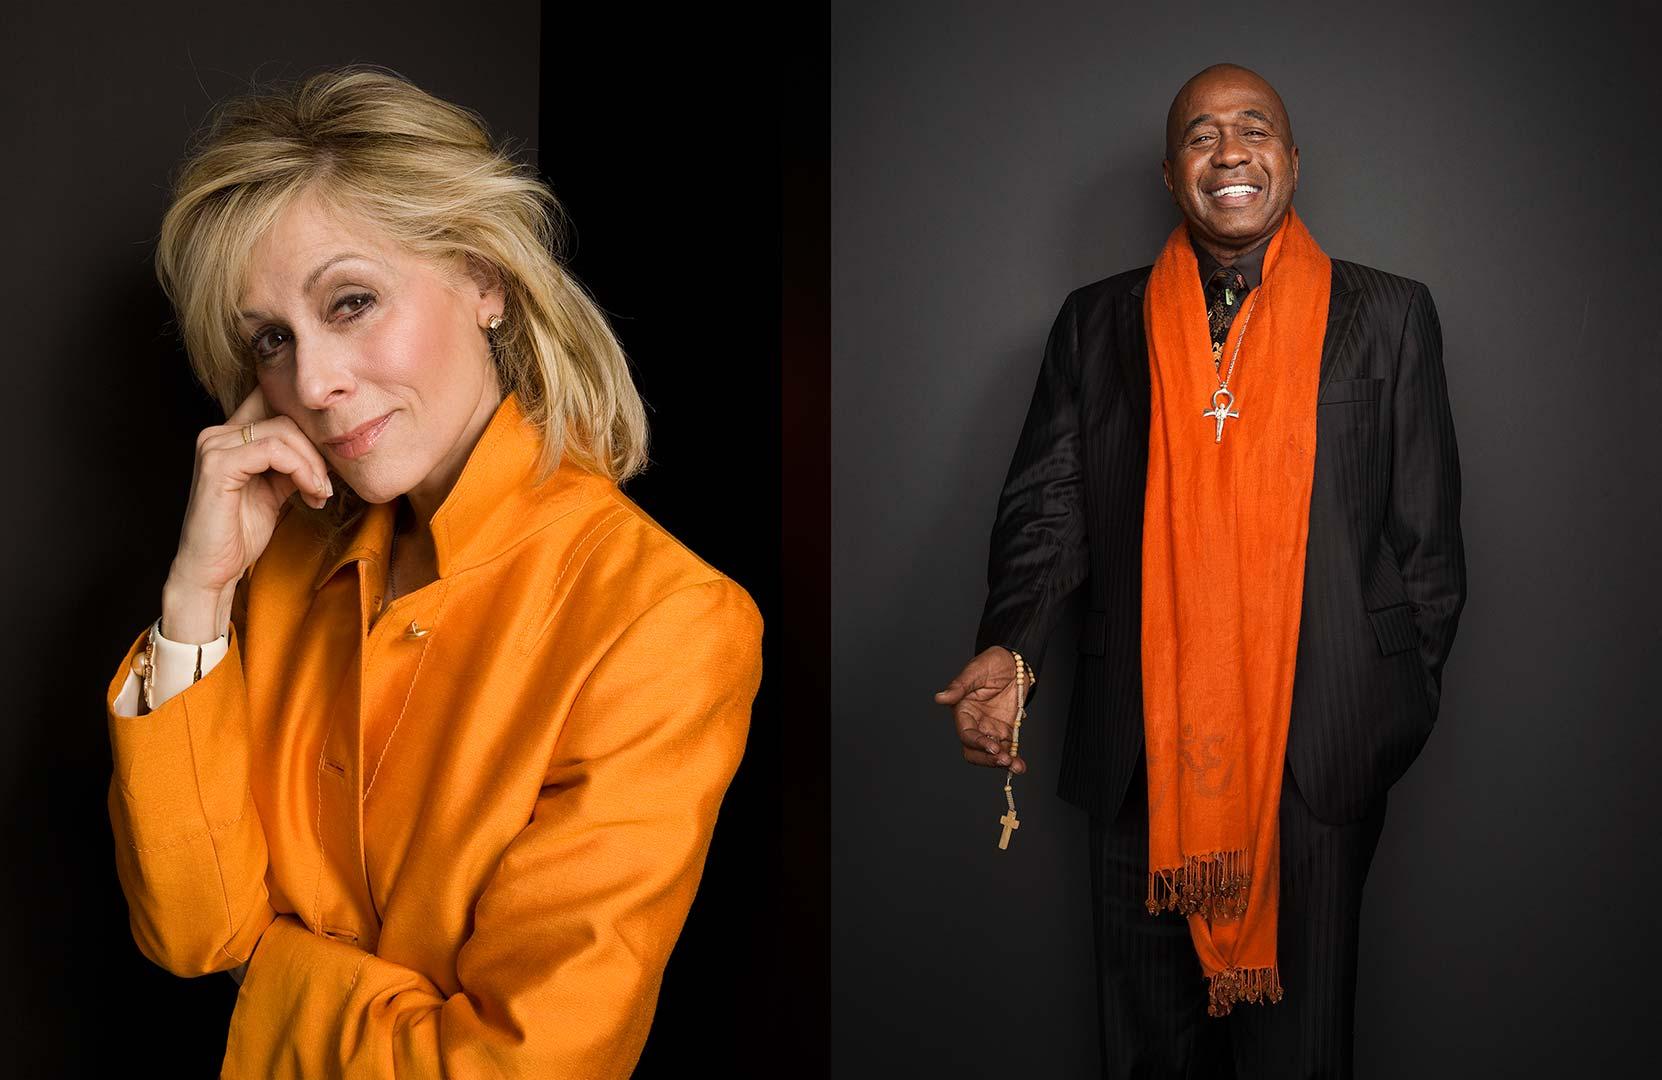 Celebrity portrait photography of Judith Light and Ben Vereen